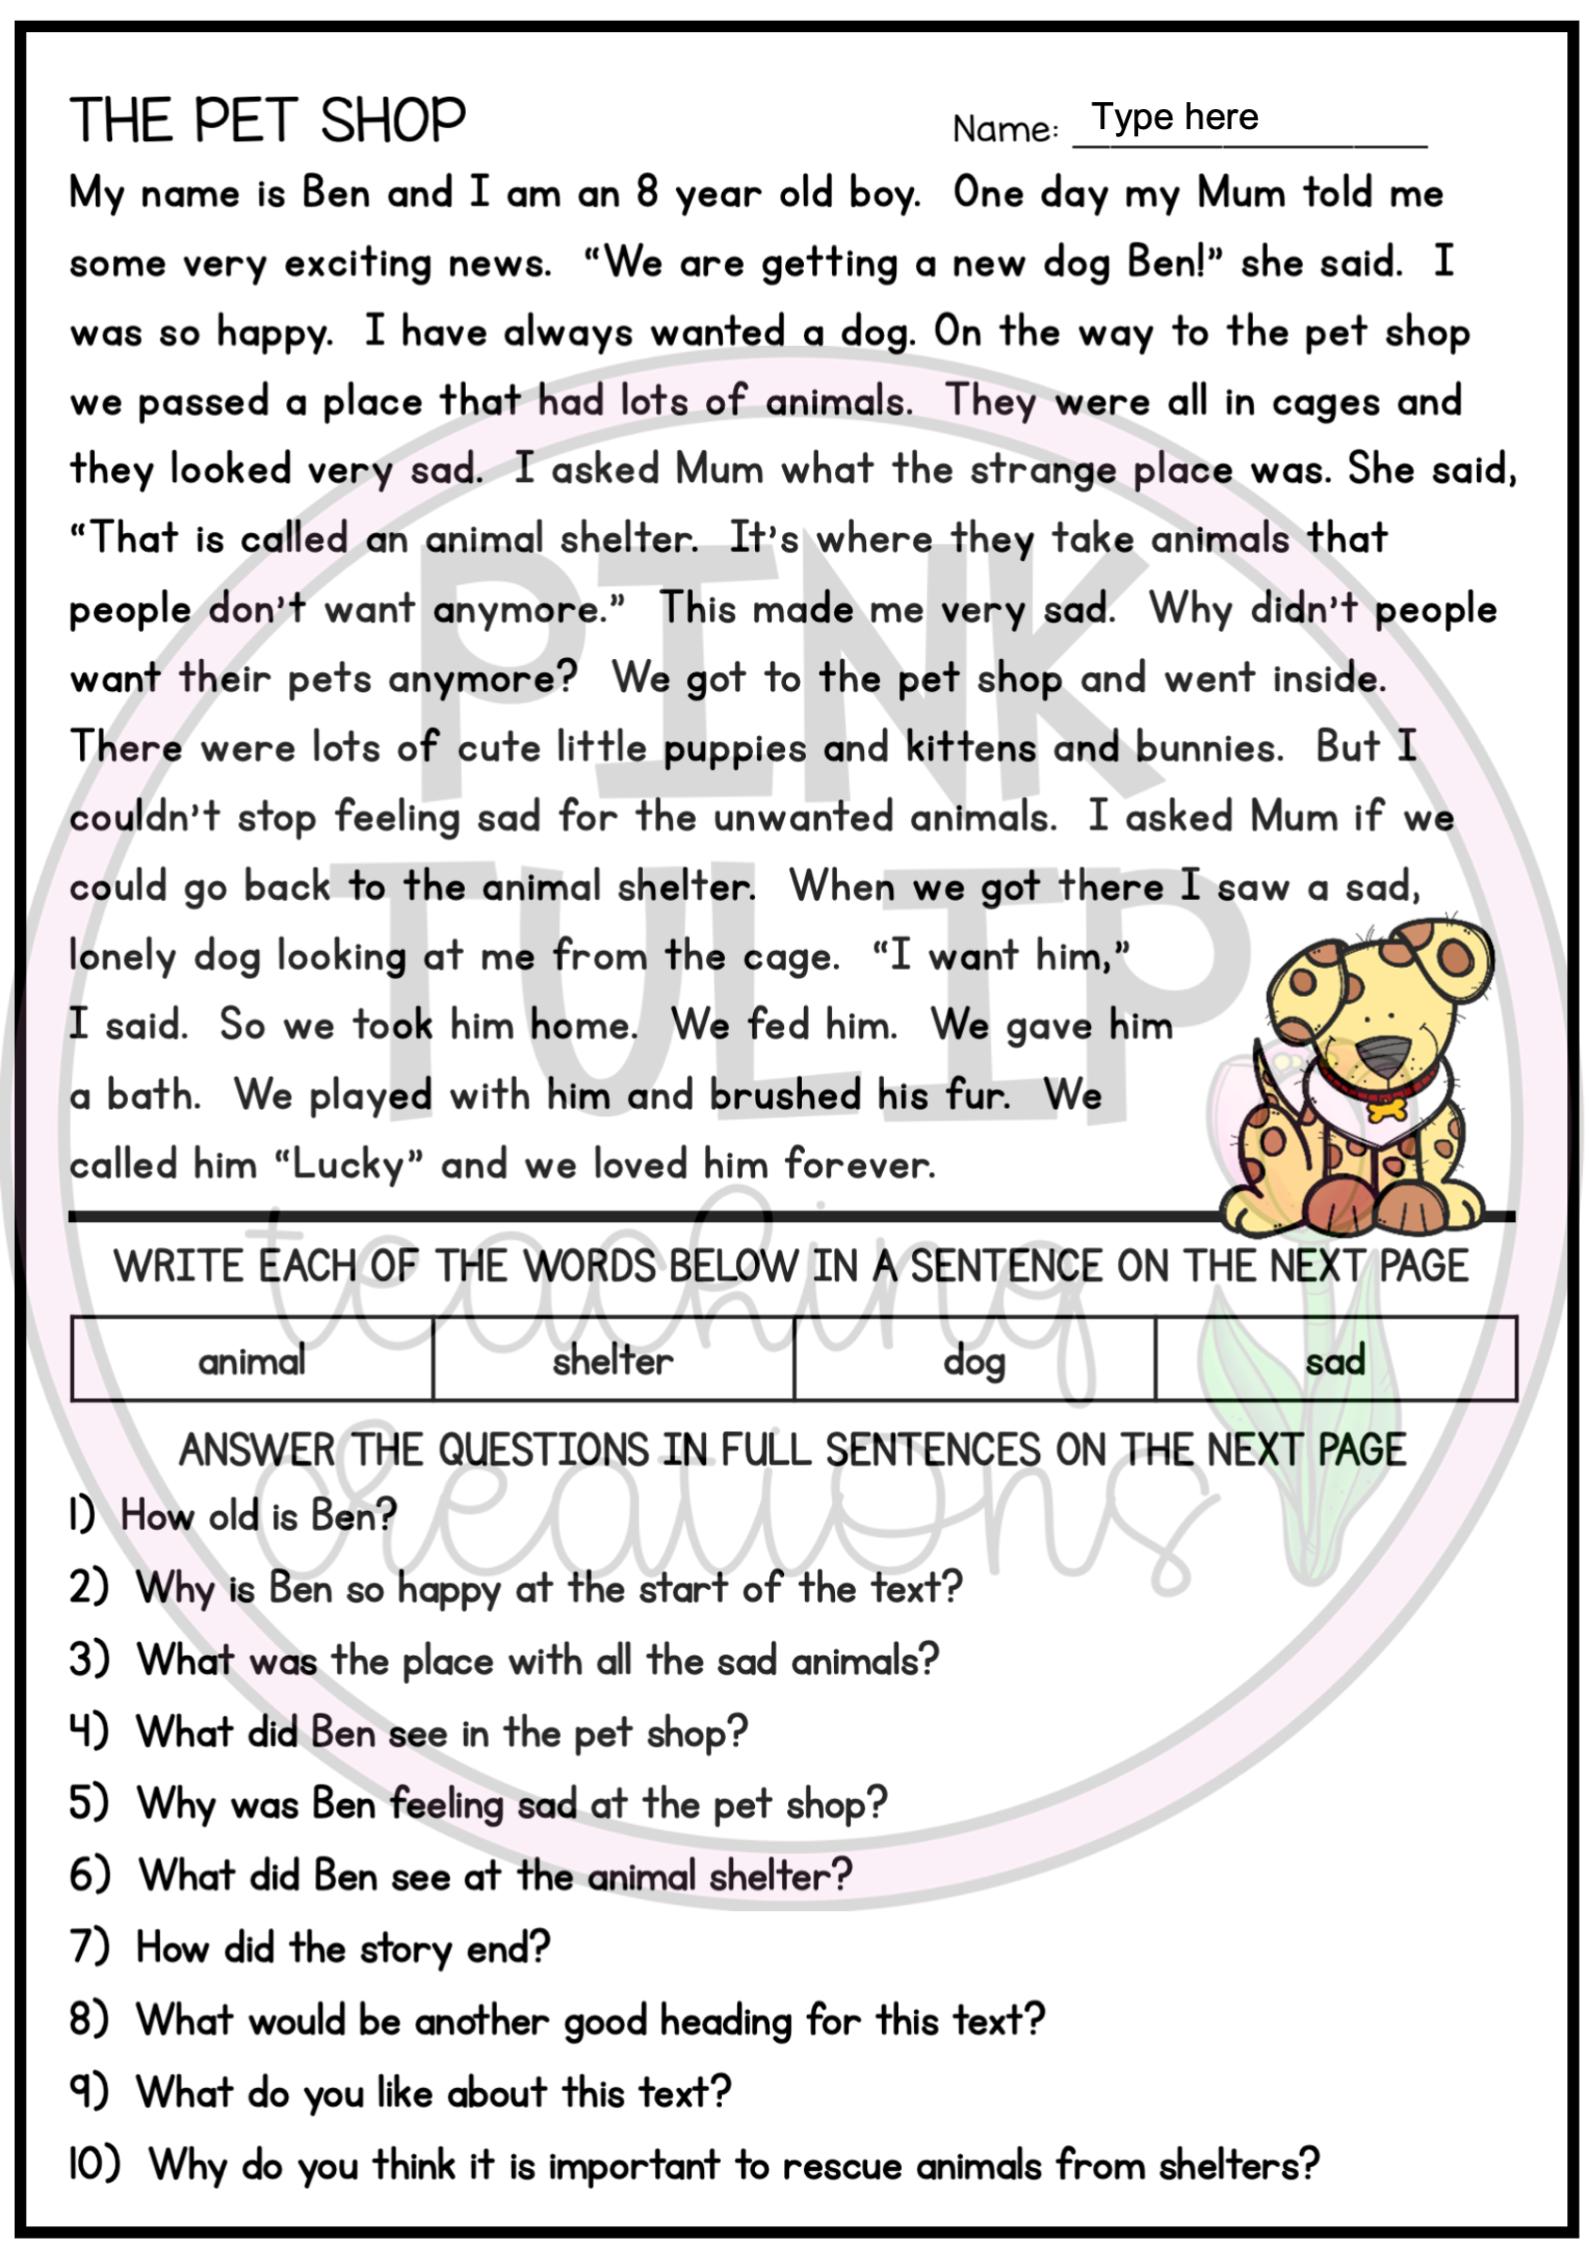 10 Page Reading Comprehension Worksheet Pack Google Slides Distance Le Reading Comprehension Worksheets Reading Comprehension Texts Comprehension Worksheets [ 2249 x 1589 Pixel ]